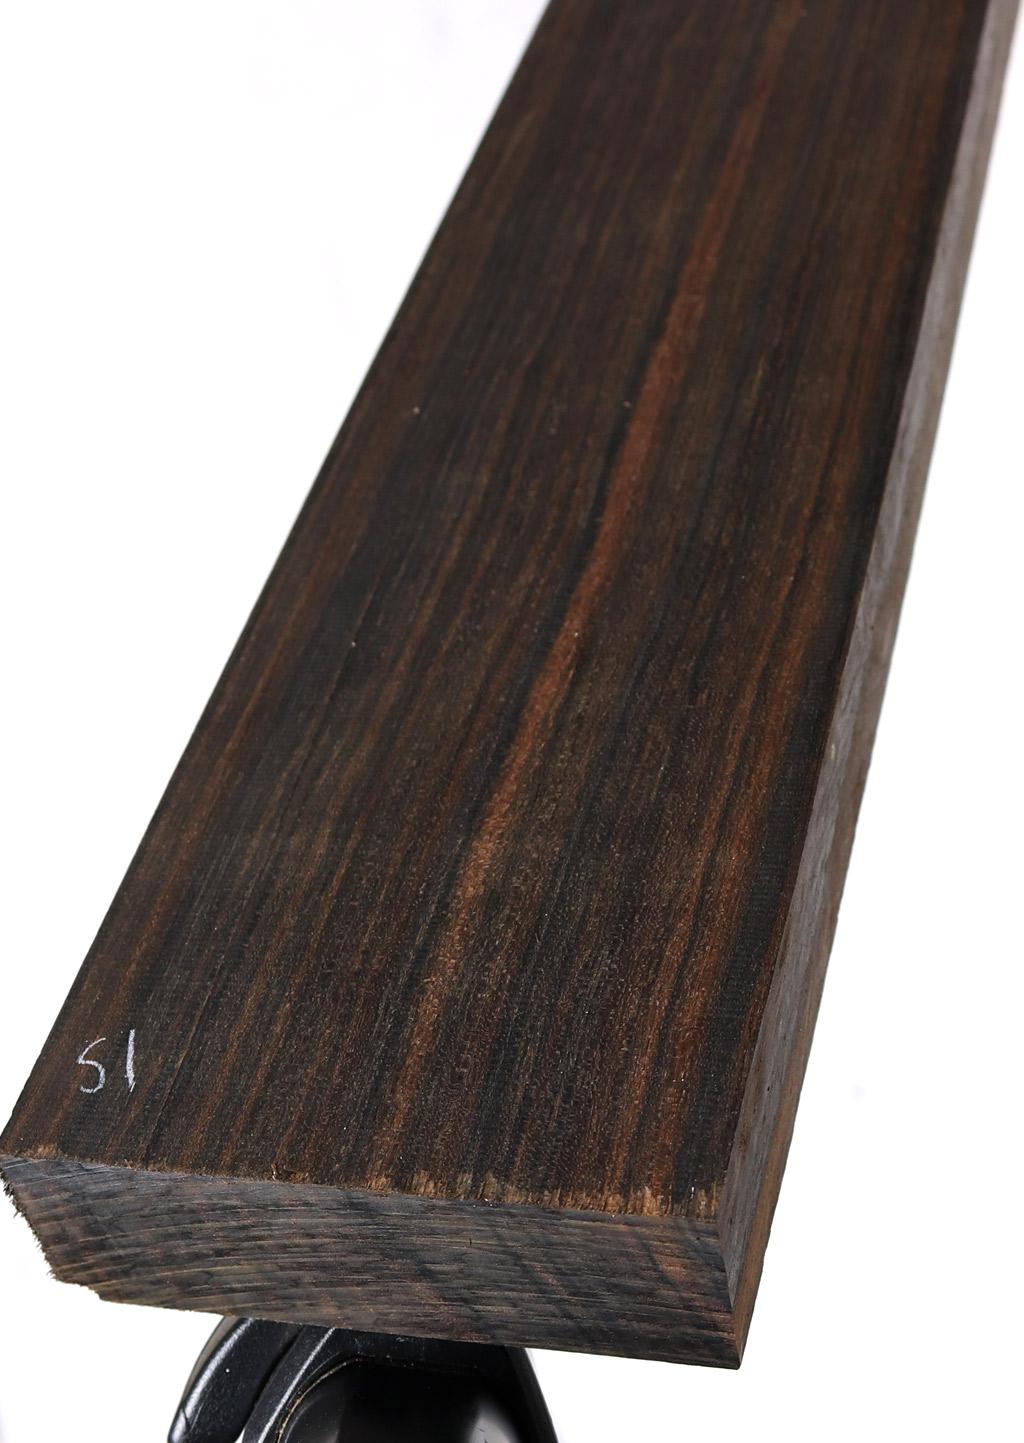 Tone Ninja 3-way Switch Tip in Macassar Ebony wood Fits most US Gibson etc